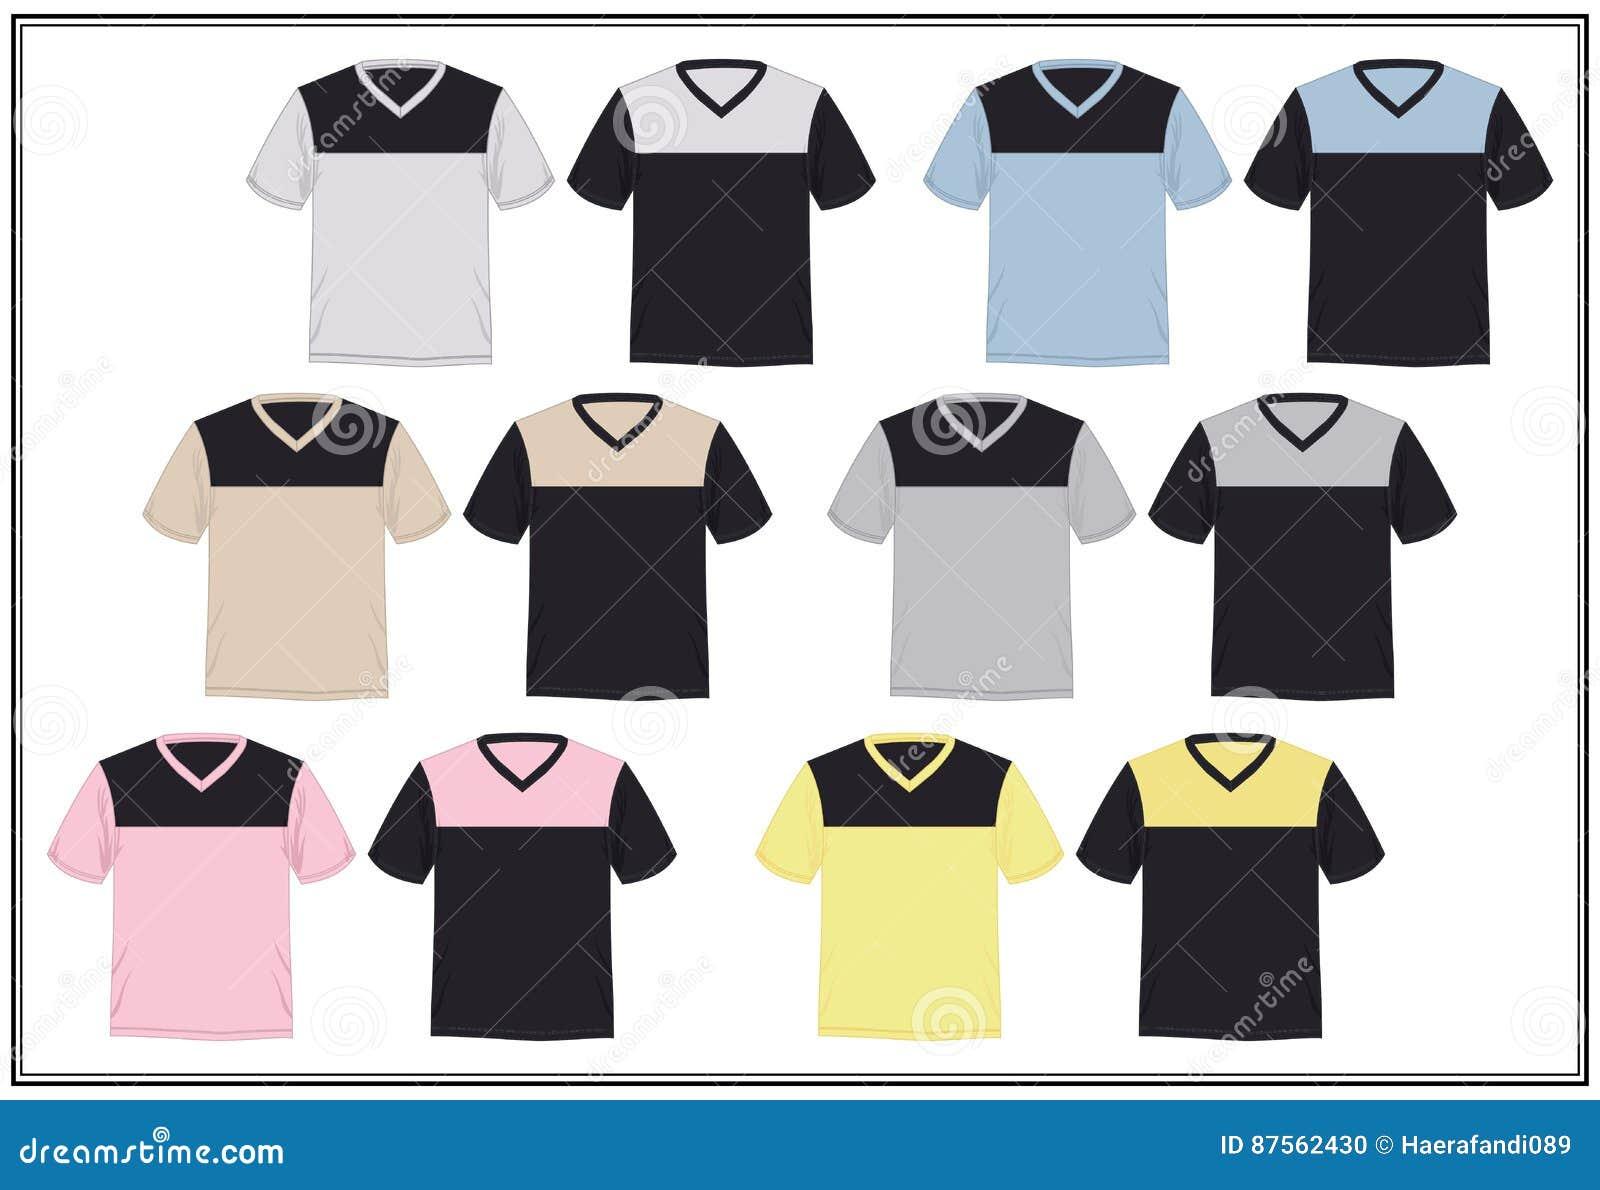 Design shirt v neck - Design Template T Shirt V Neck Combination Bright Color Vector